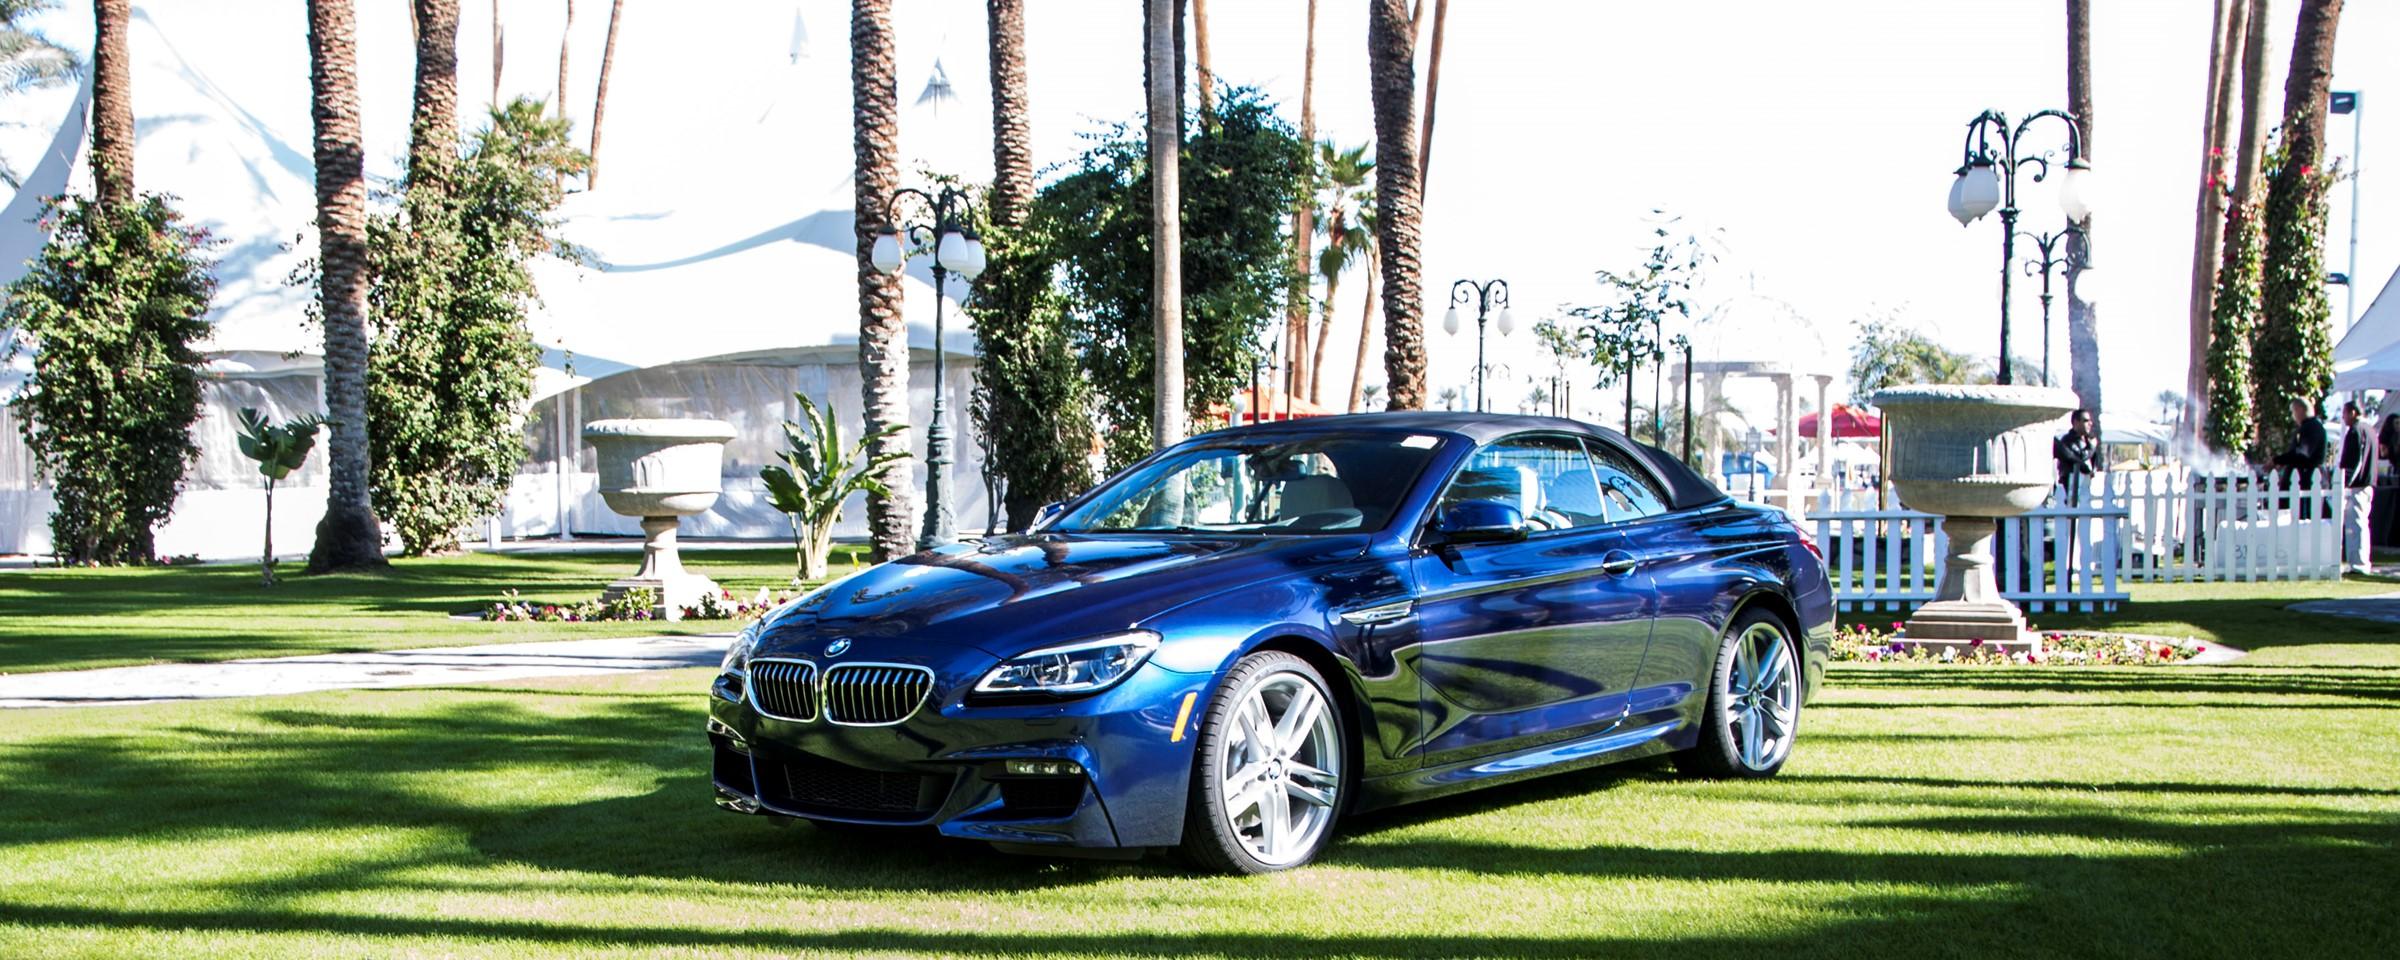 BMW of Palm Springs Blog  BMW of Palm Springs Blog  News